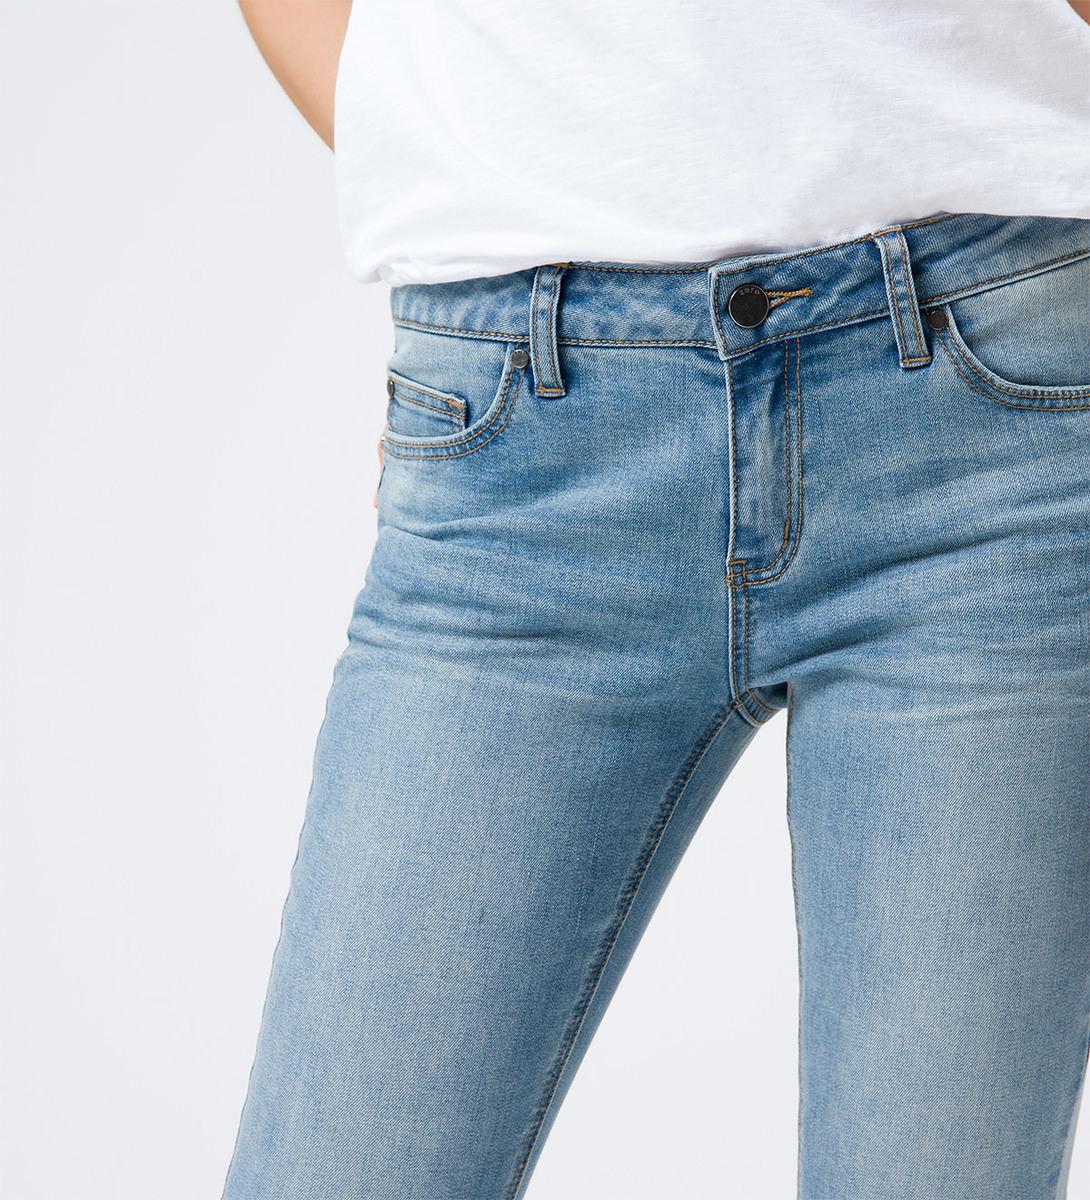 Jeans im Five-Pocket-Design in light blue authentic wash